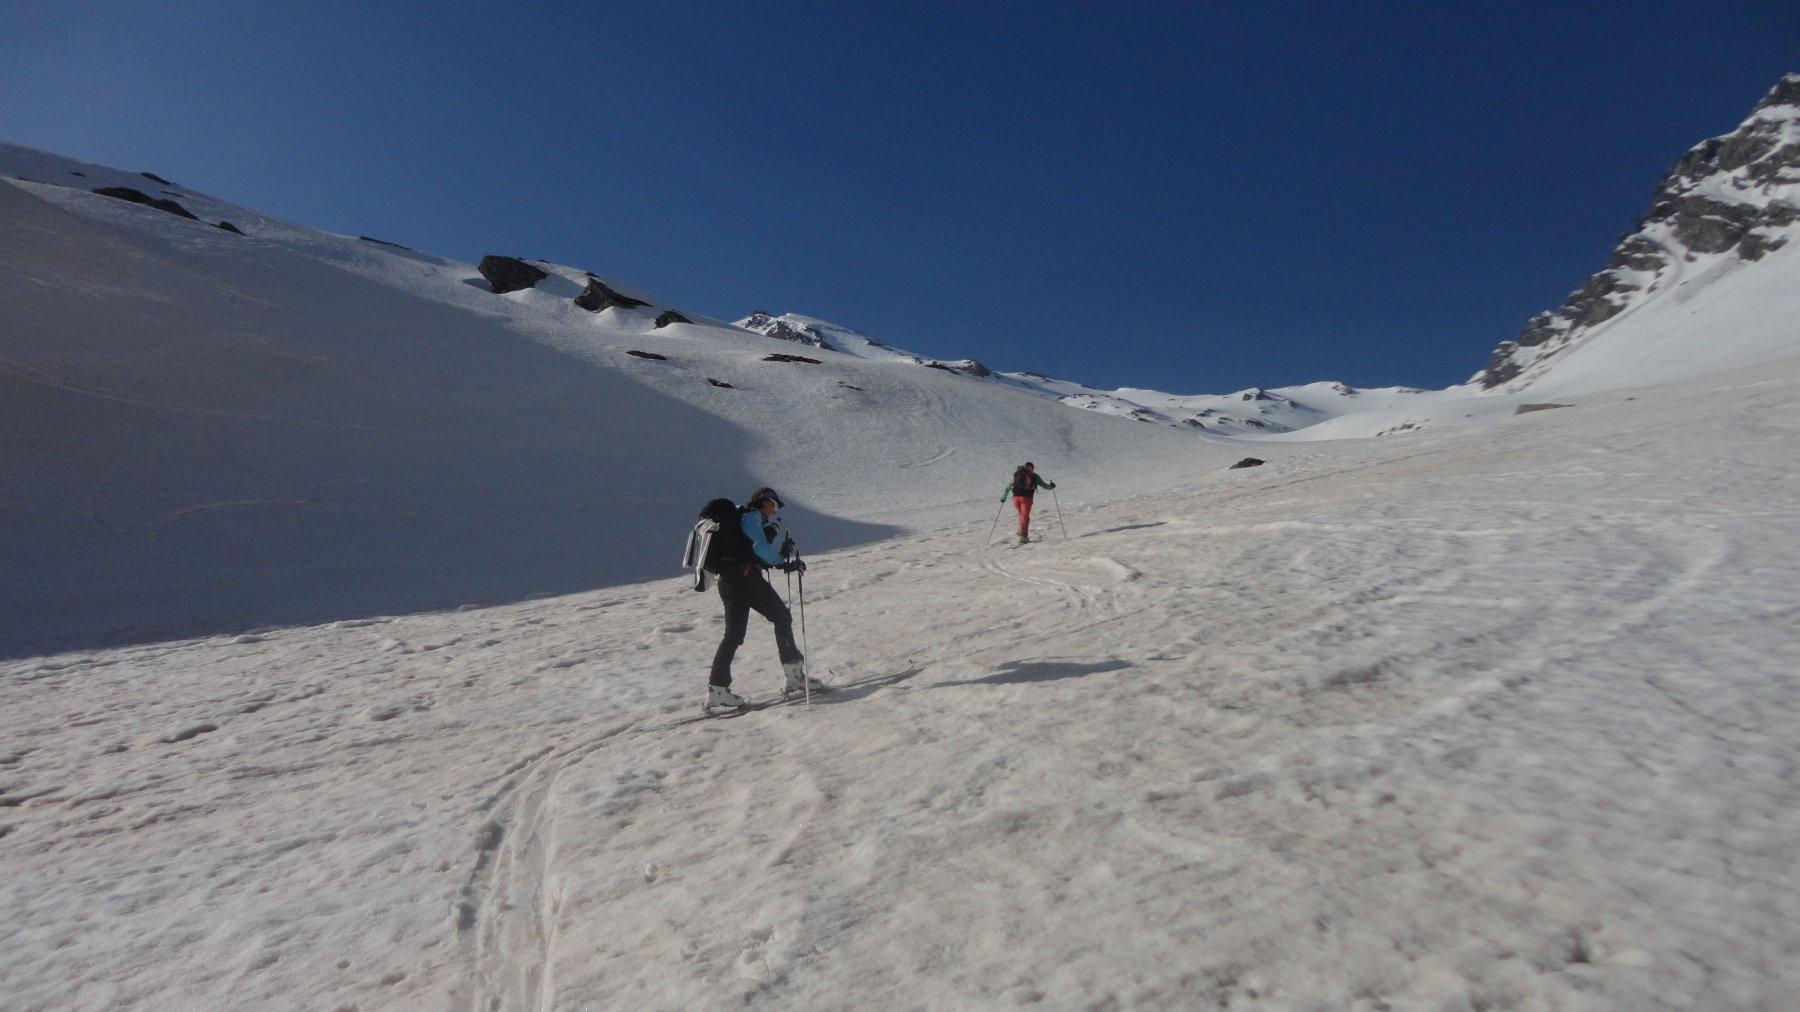 salendo si tocca la neve sahariana...